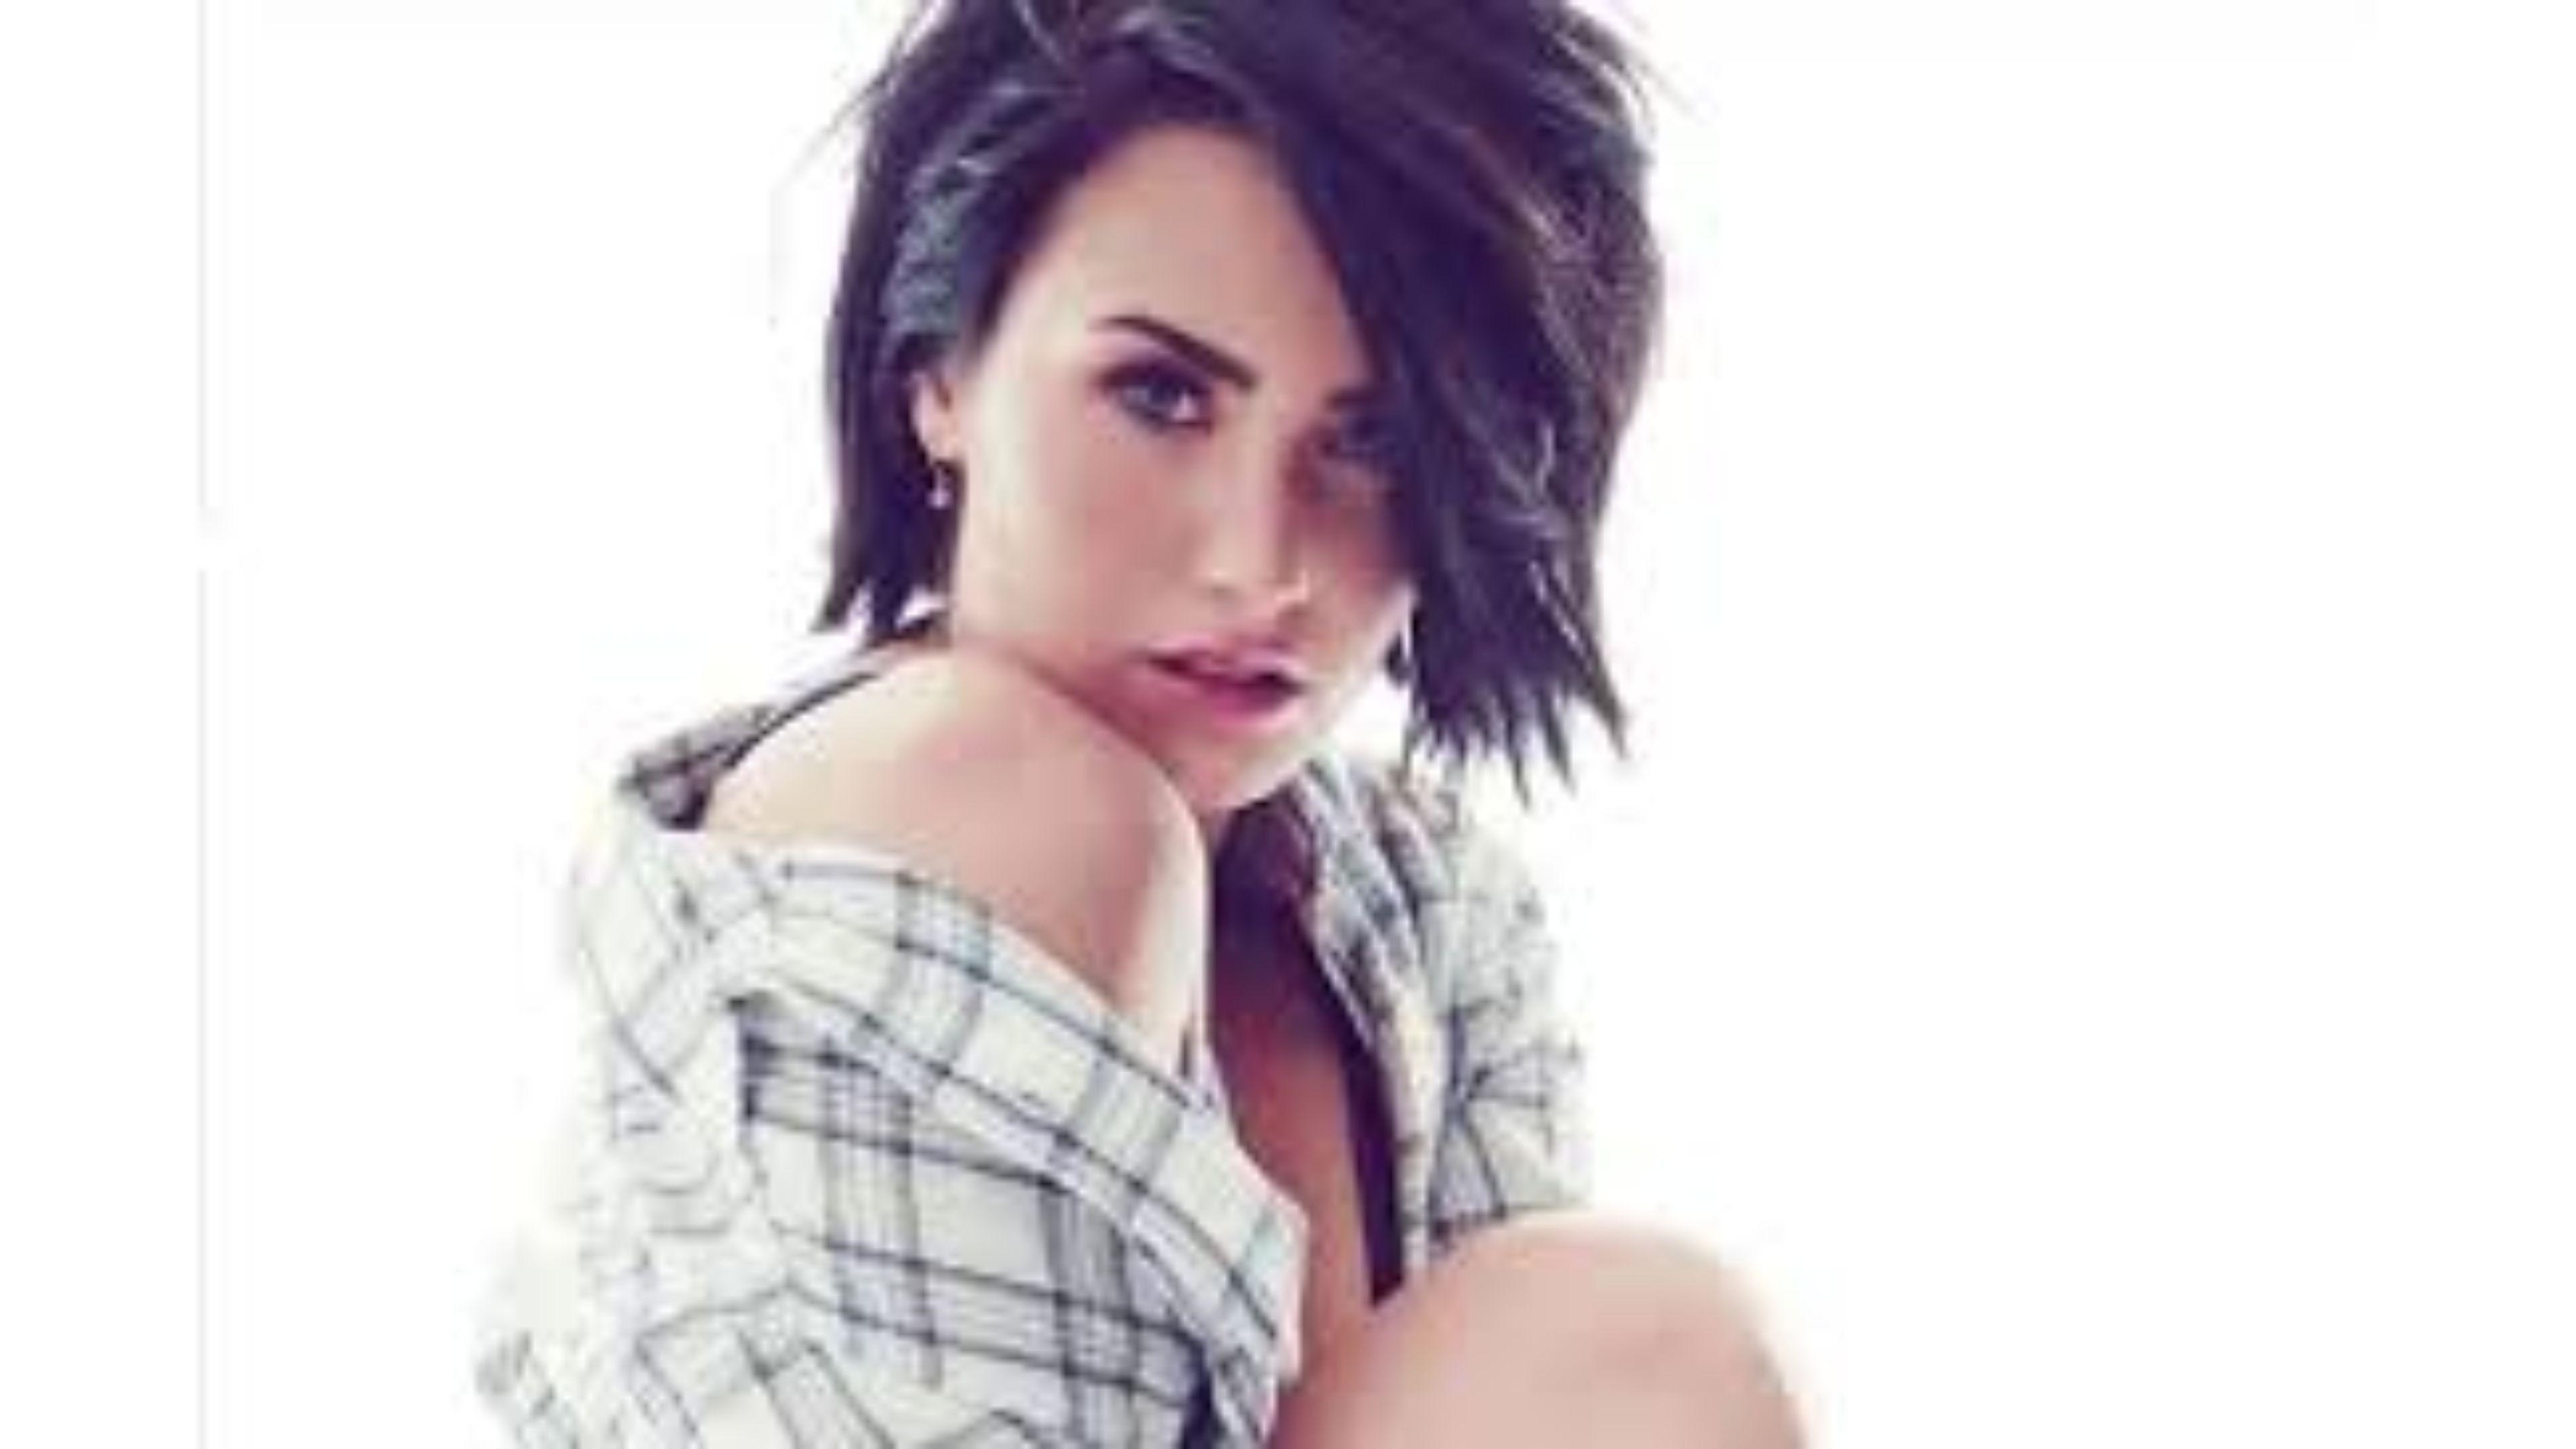 Boxing Ring Wallpaper Hd Demi Lovato Wallpapers Hd 2016 Wallpaper Cave